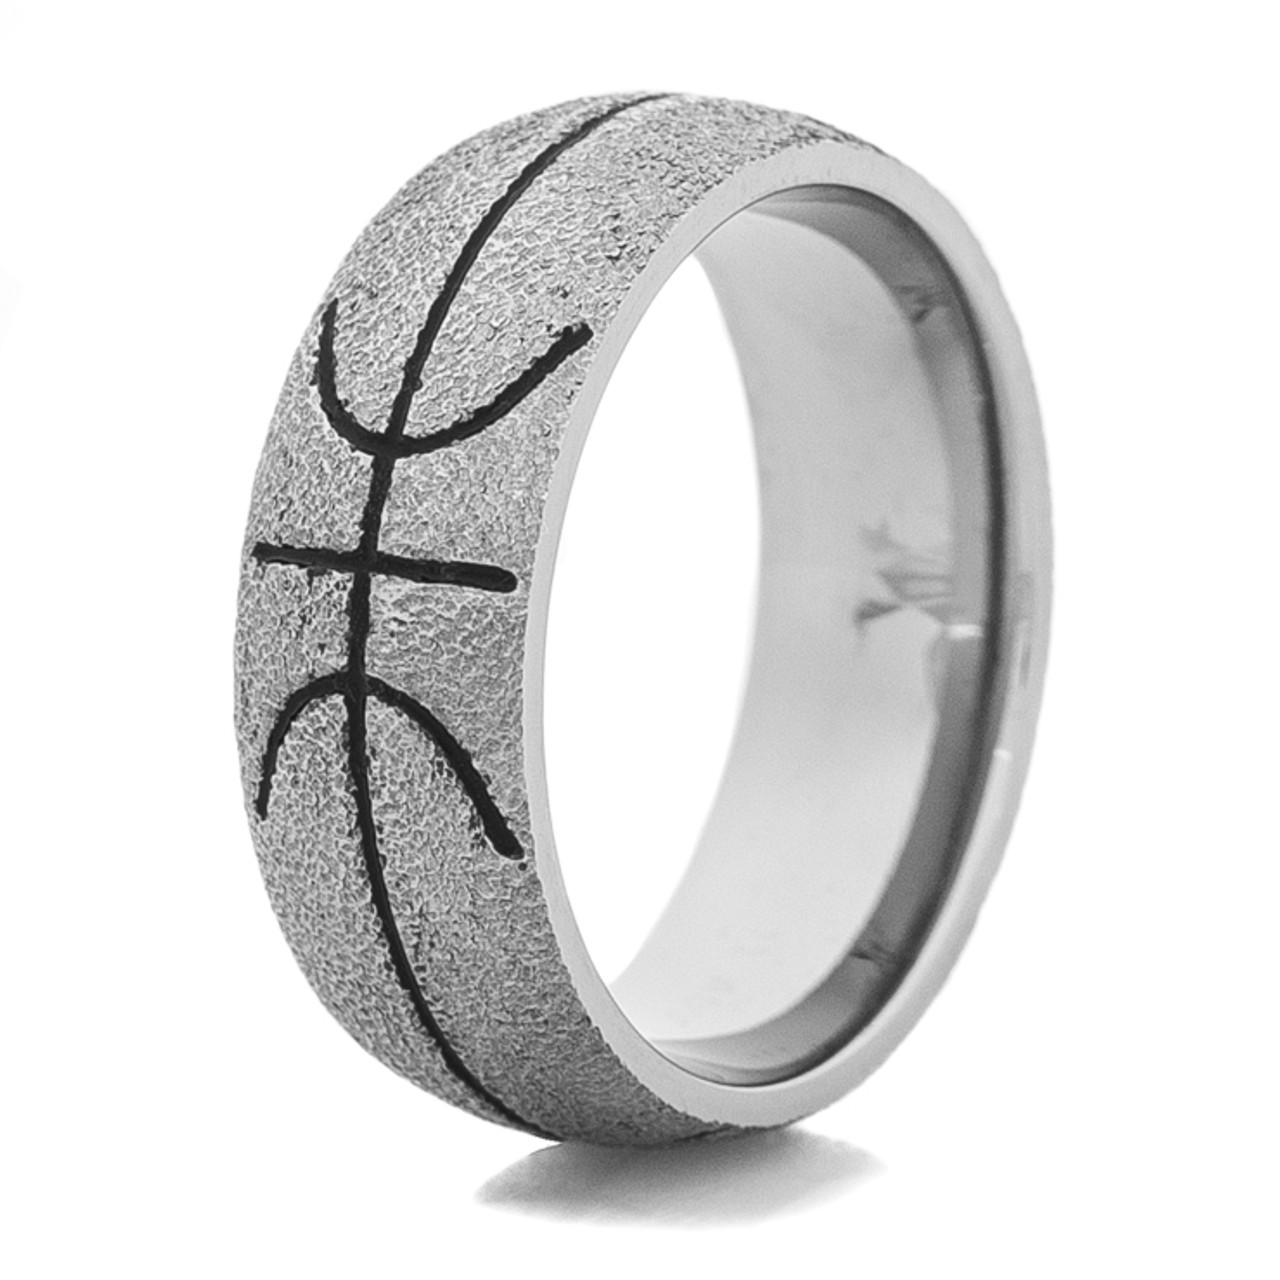 Titanium Basketball ring with Black Inlay TitaniumBuzz